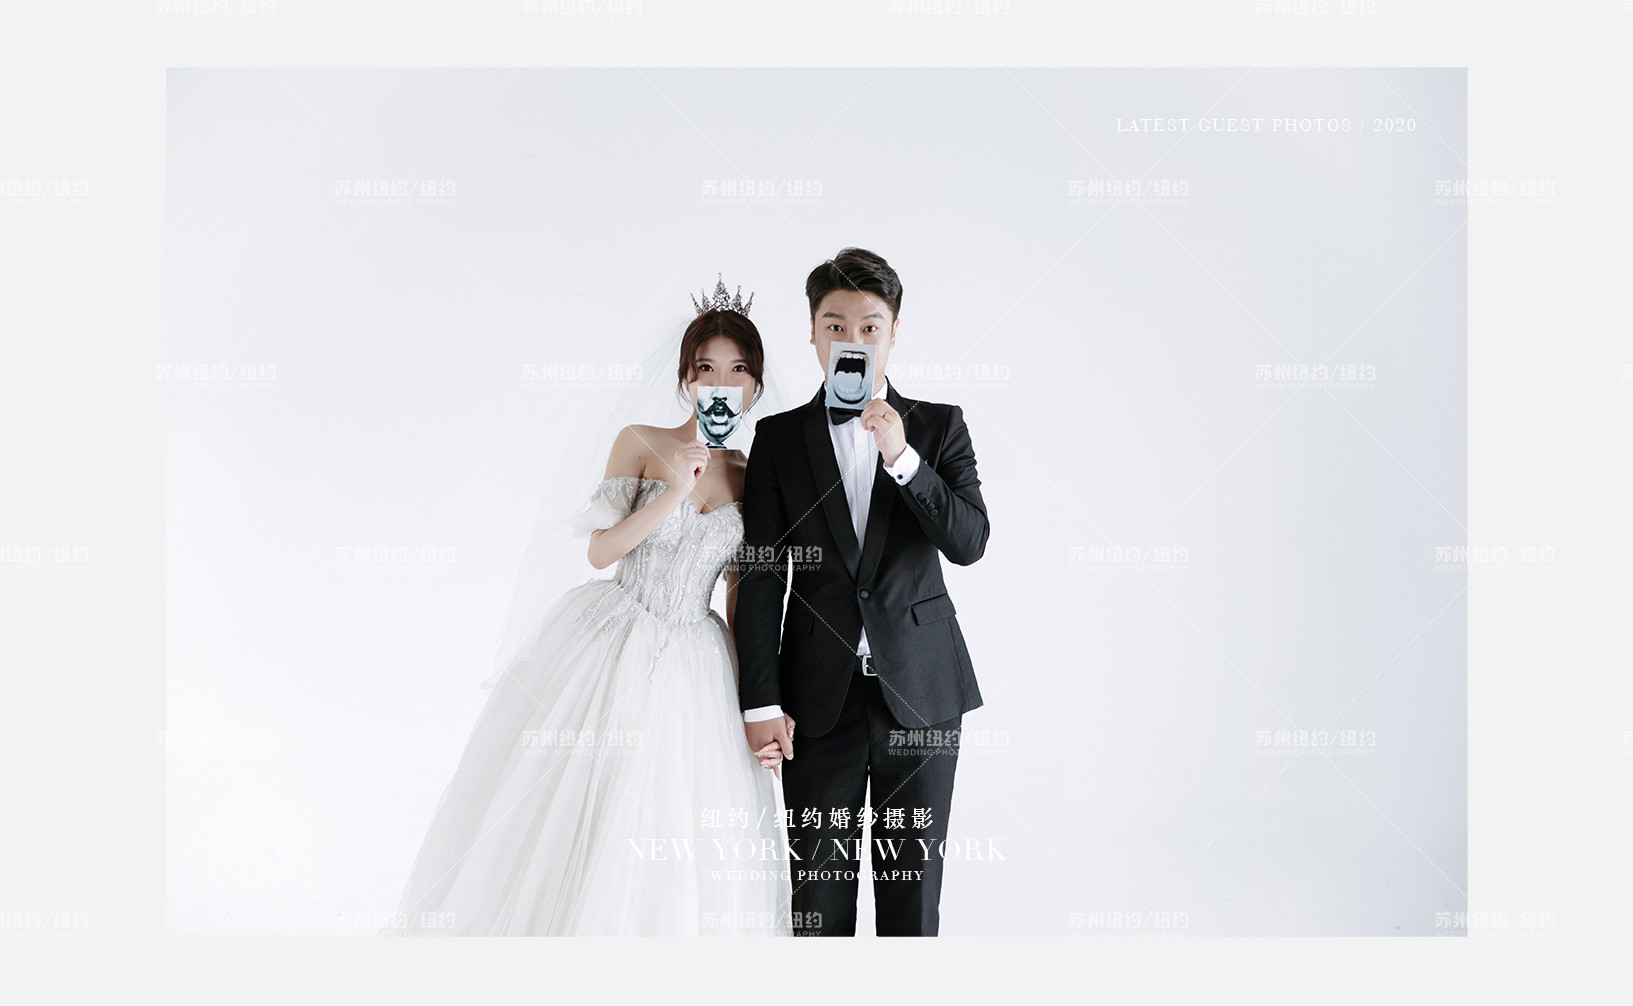 Mr.向 & Ms.府(纽约纽约最新客照)婚纱摄影照